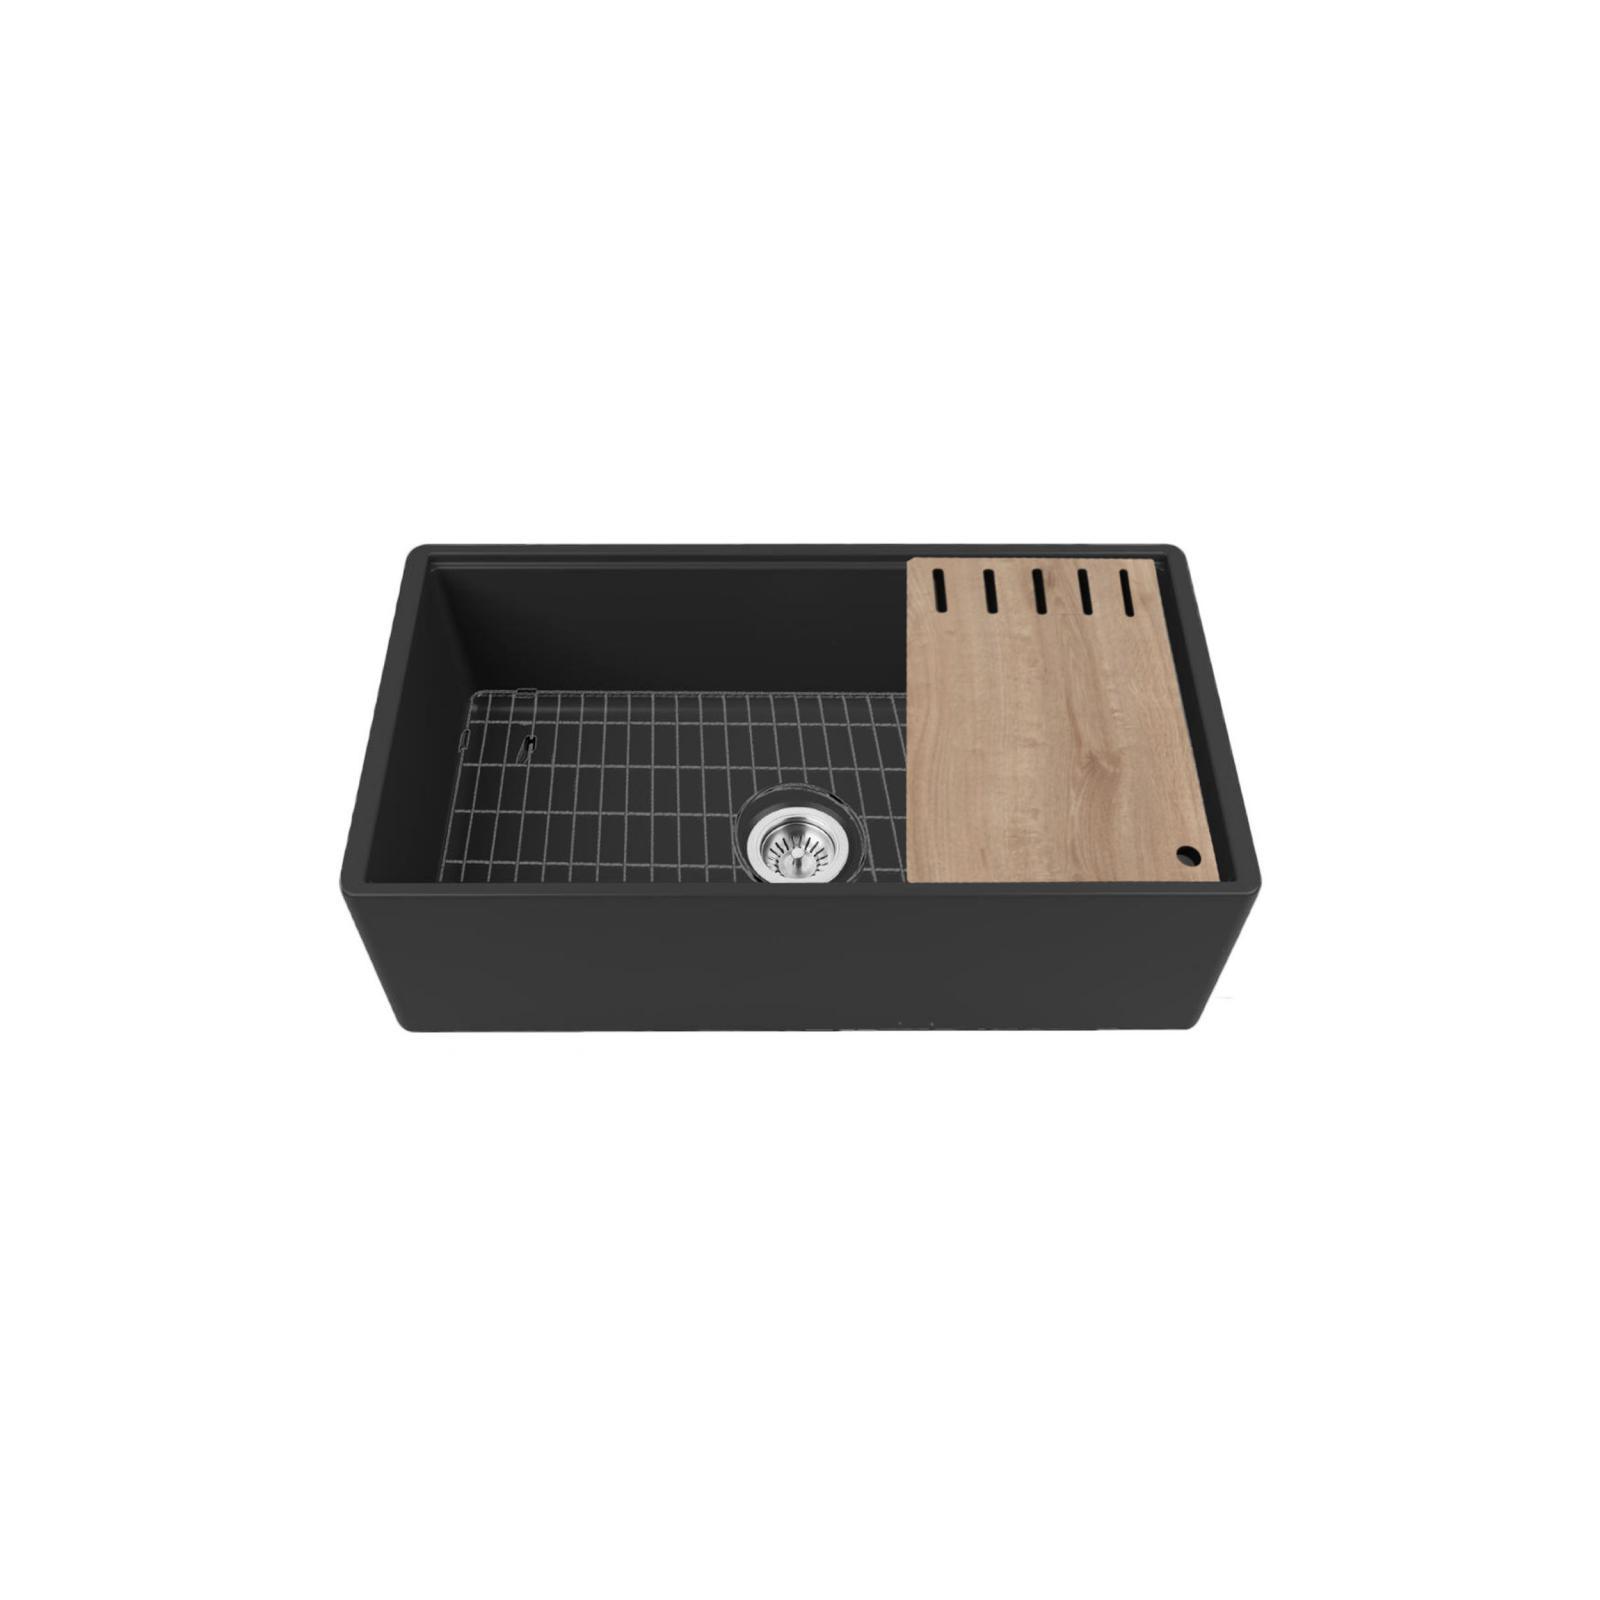 High-quality sink Louis Le Grand III black - single bowl, ceramic - 3